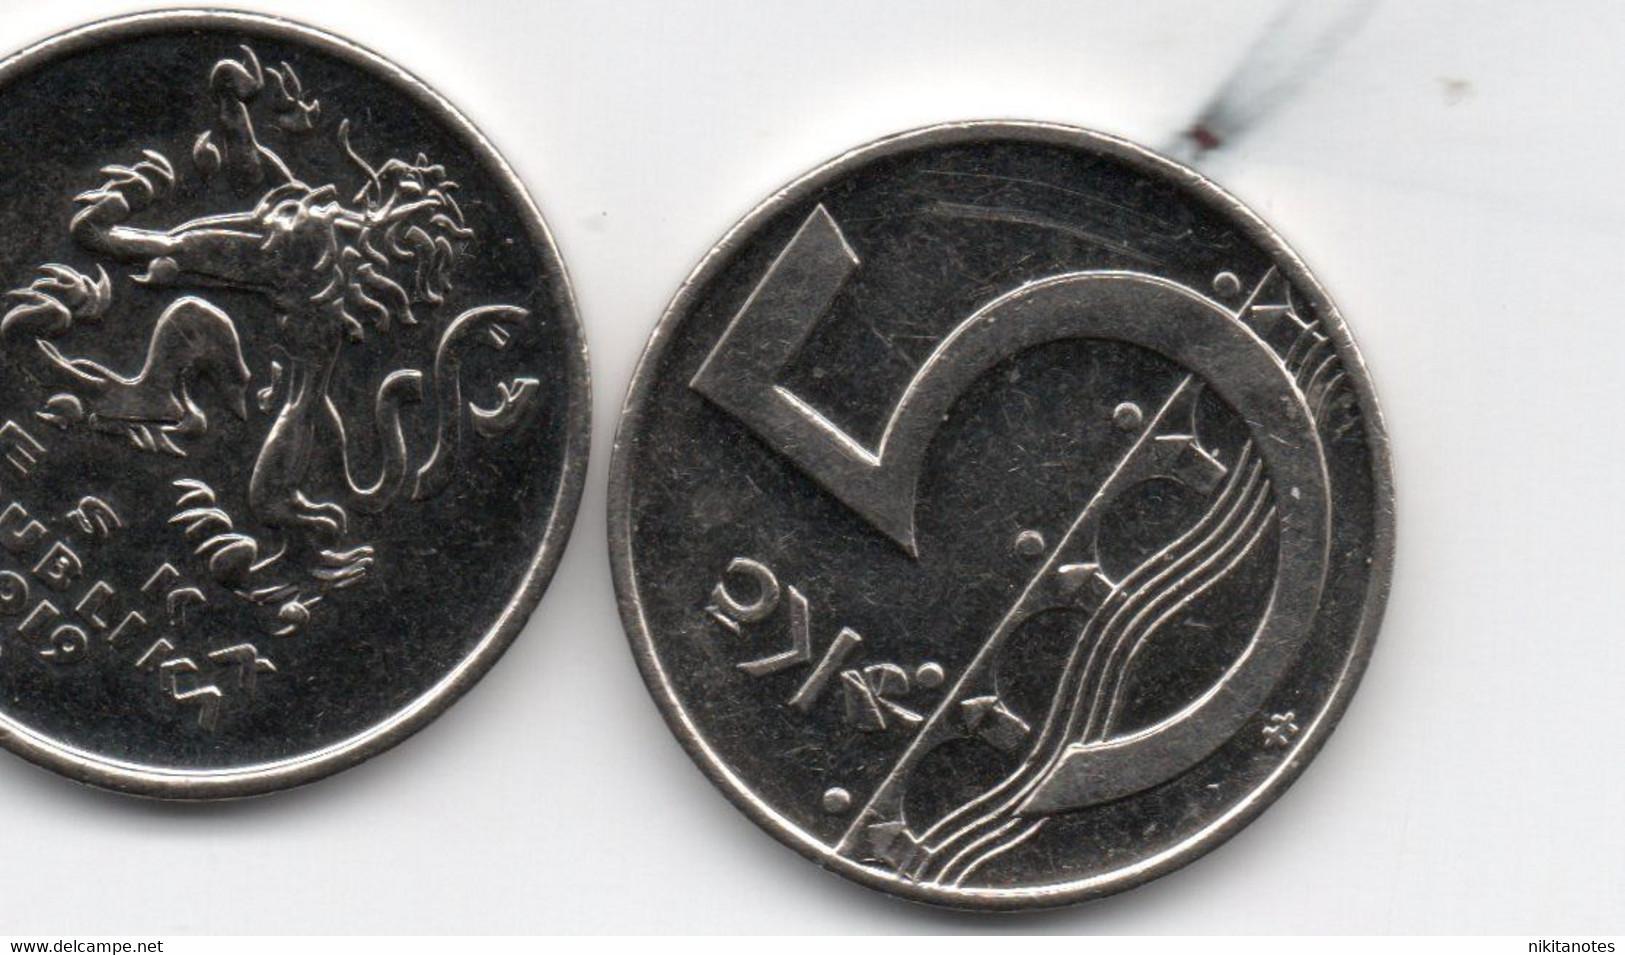 Arctic Territories, $1, 2012, Polymer, UNC Actic Fox - Other - America